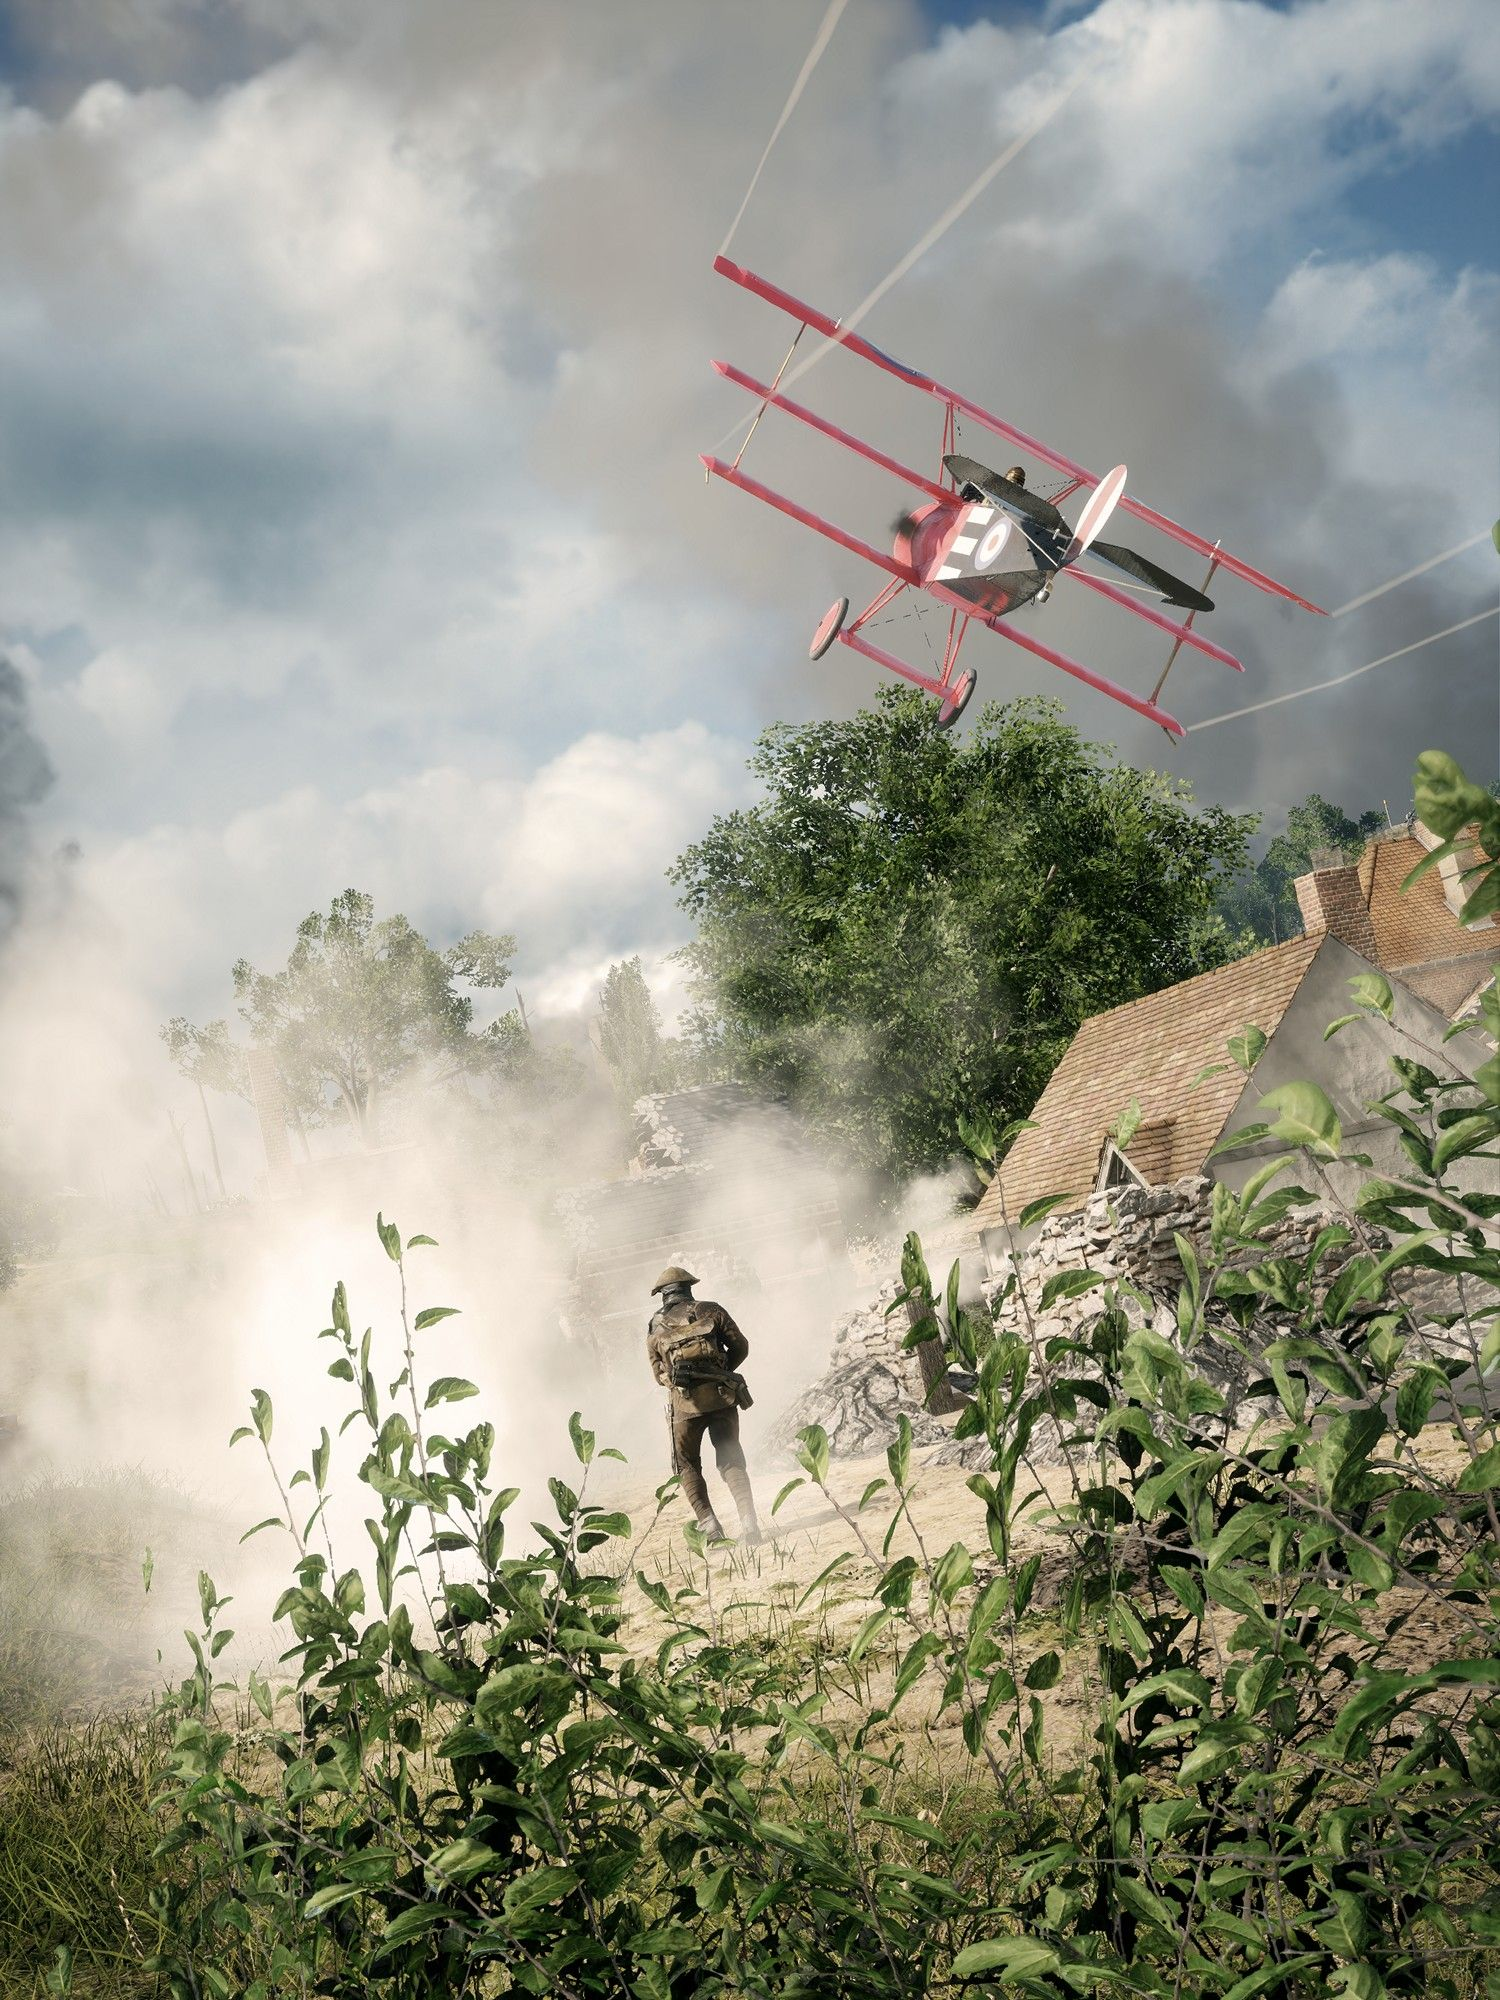 3f96998314ef0daff412b14ea25d88ea - How To Get In A Plane In Battlefield 1